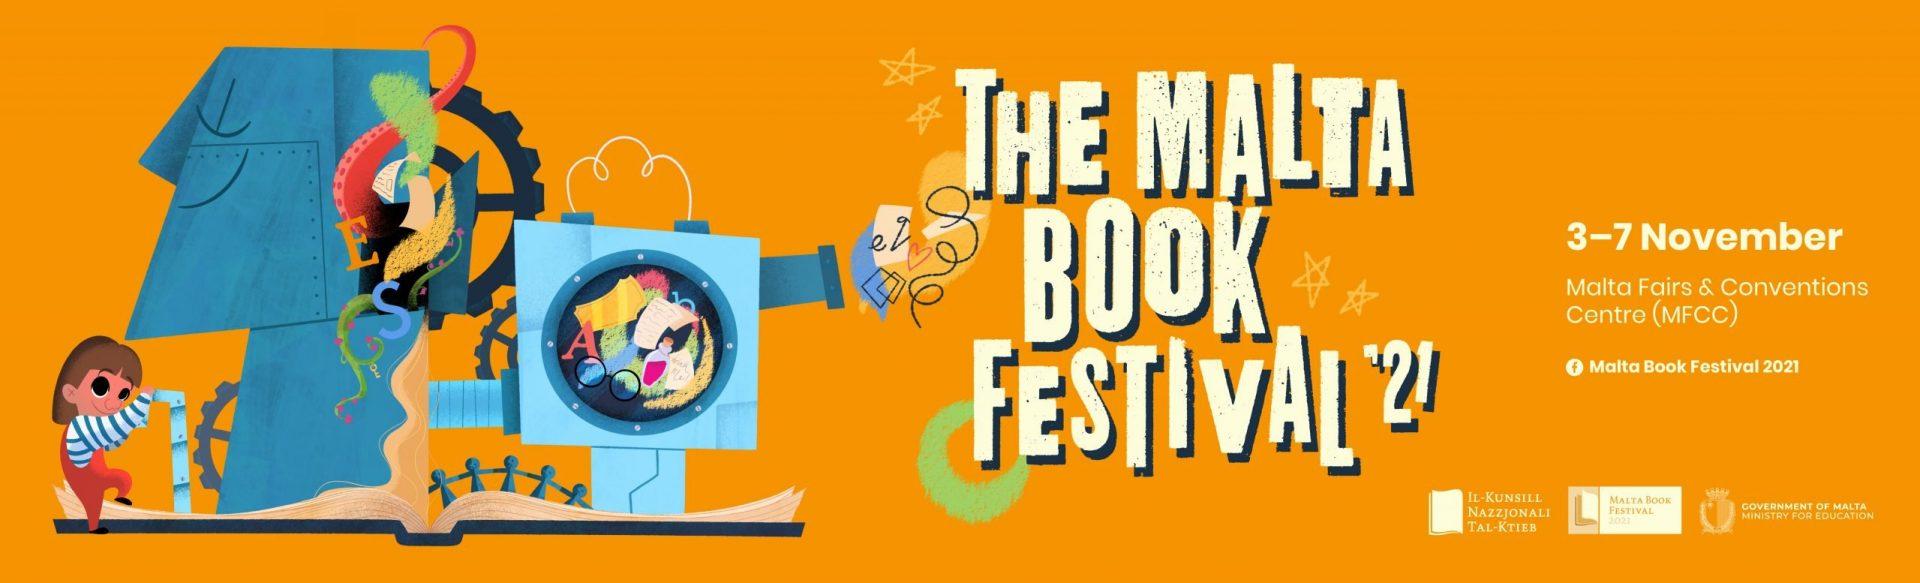 BookFestival_WebsiteBanner_1920x583px_EN